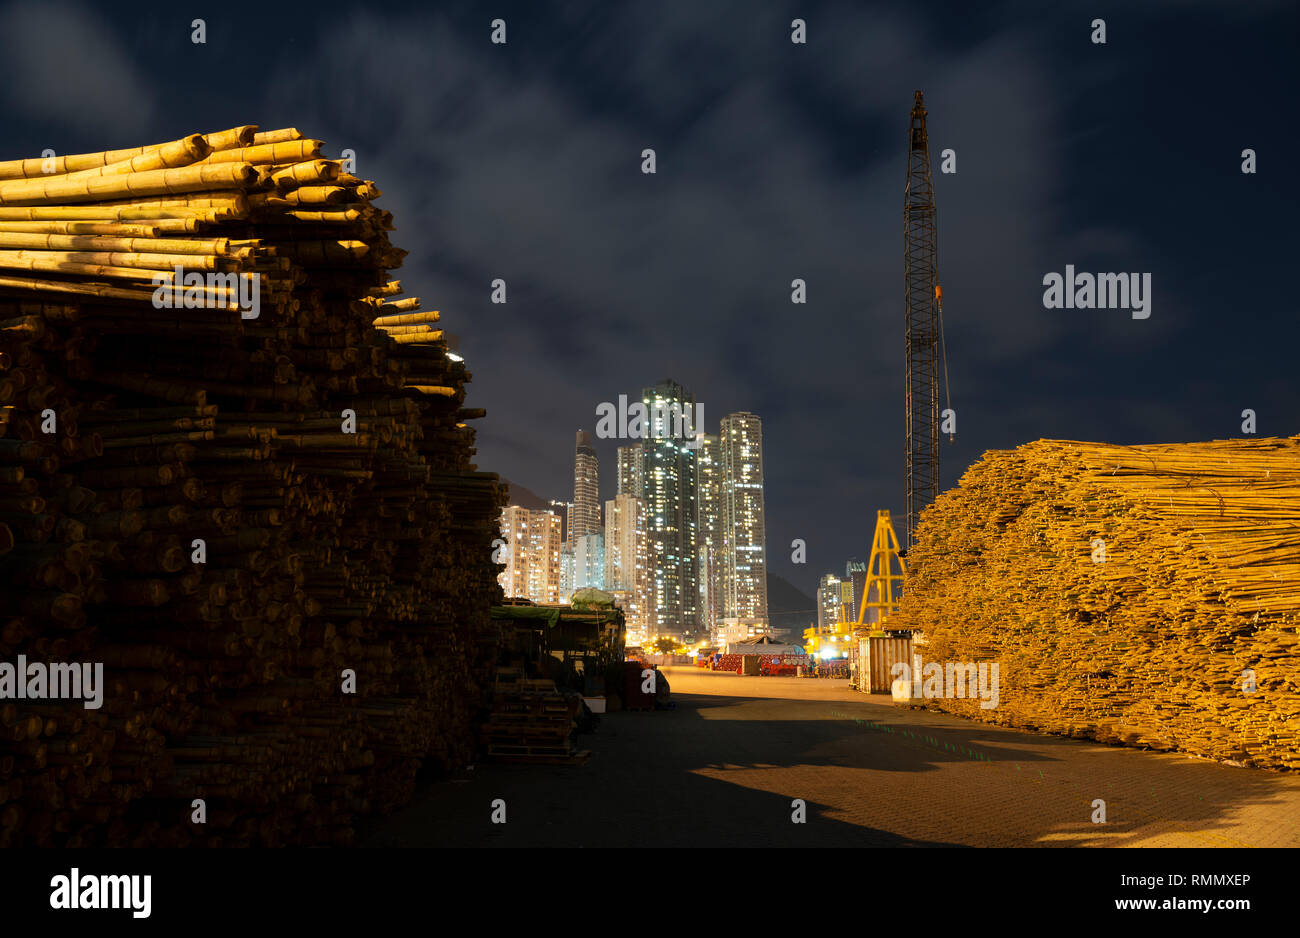 Bamboo used for building scaffolding, Hong Kong, China. - Stock Image